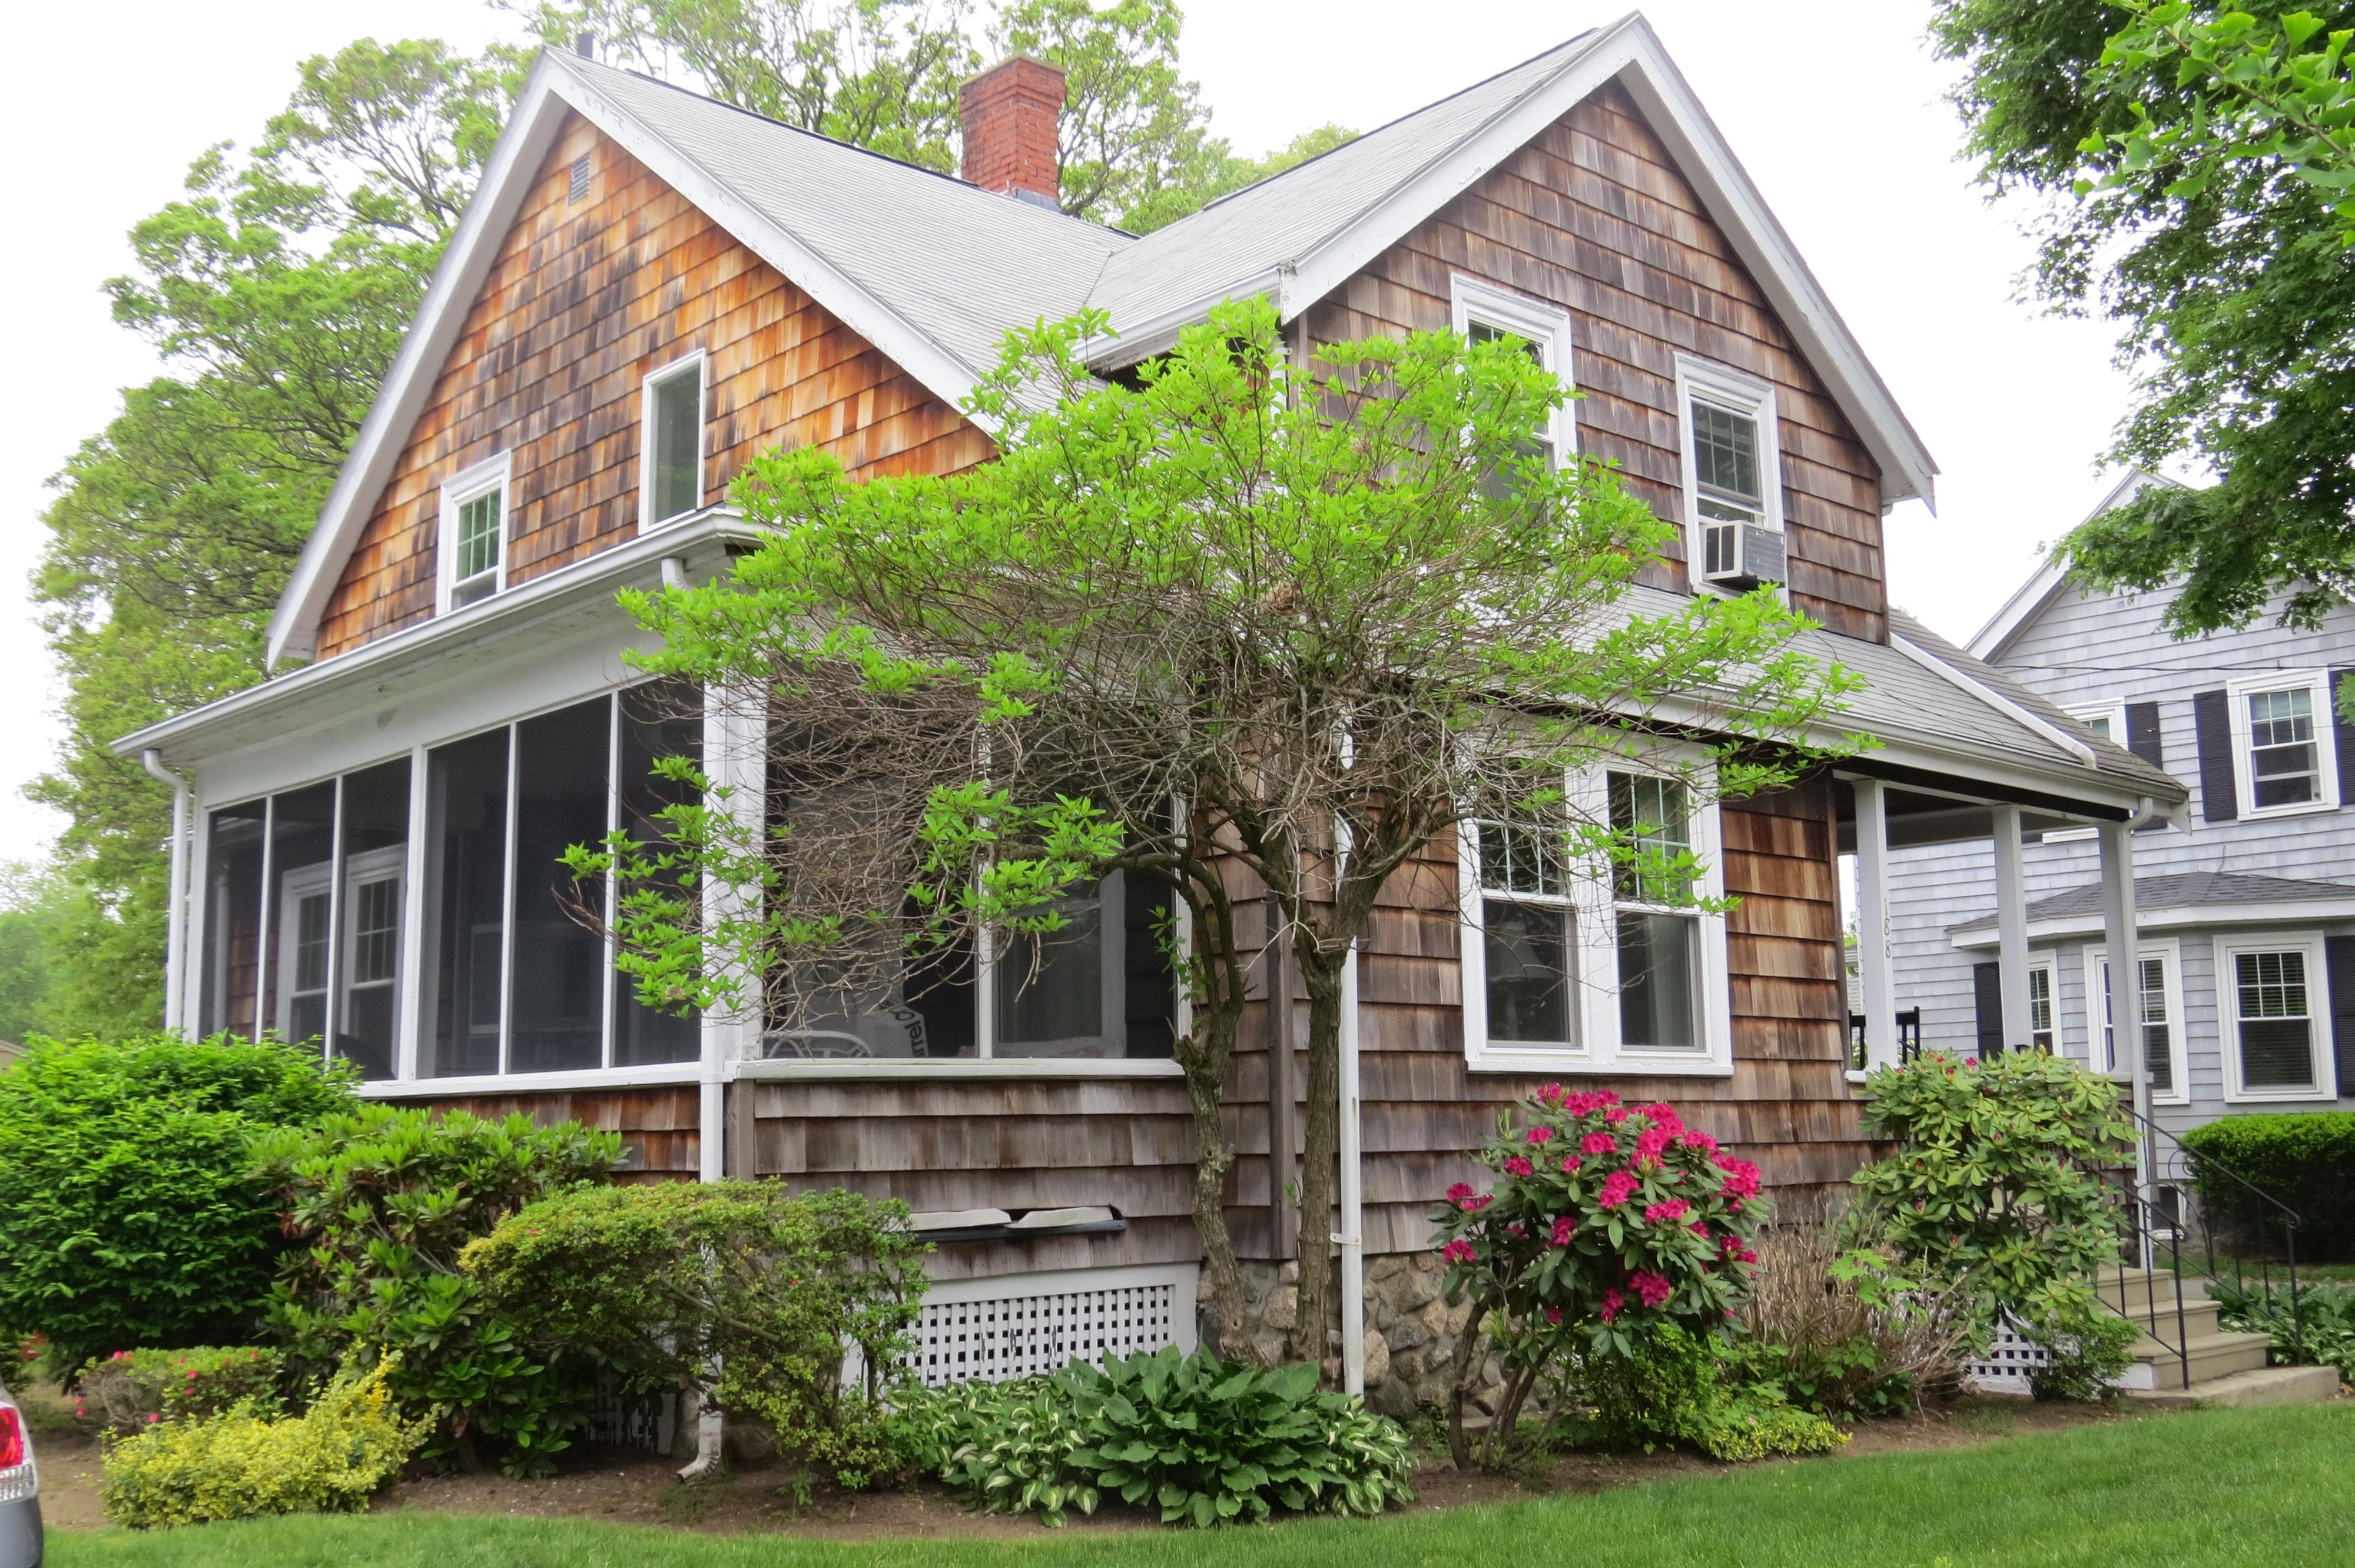 Single Family Home for Sale at Charming Home 188 Aspen Road Swampscott, Massachusetts, 01907 United States